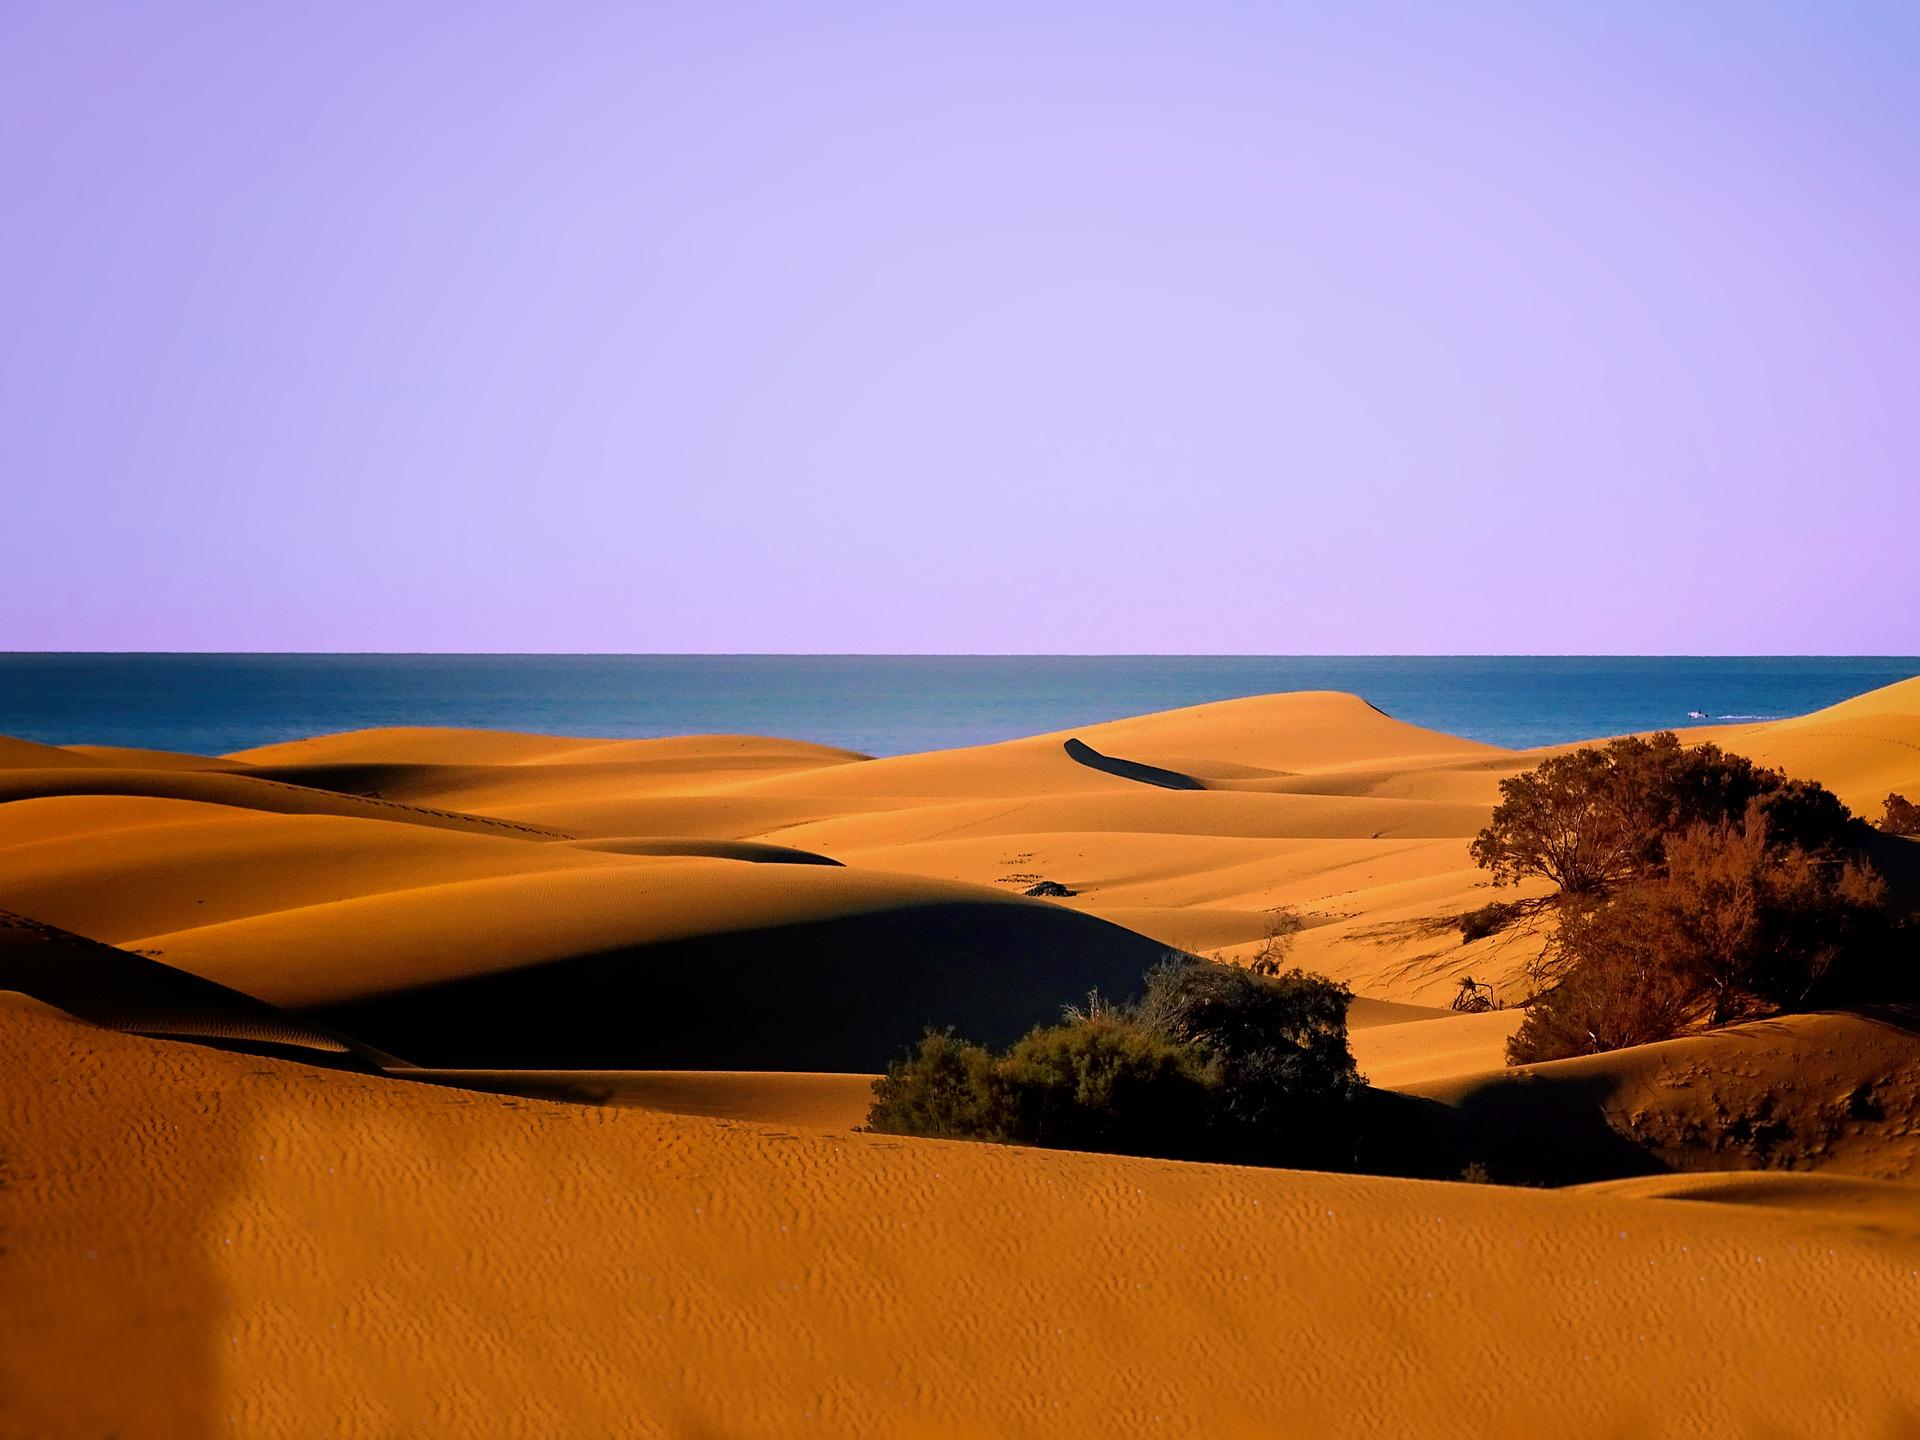 sand-dunes-3903300_1920